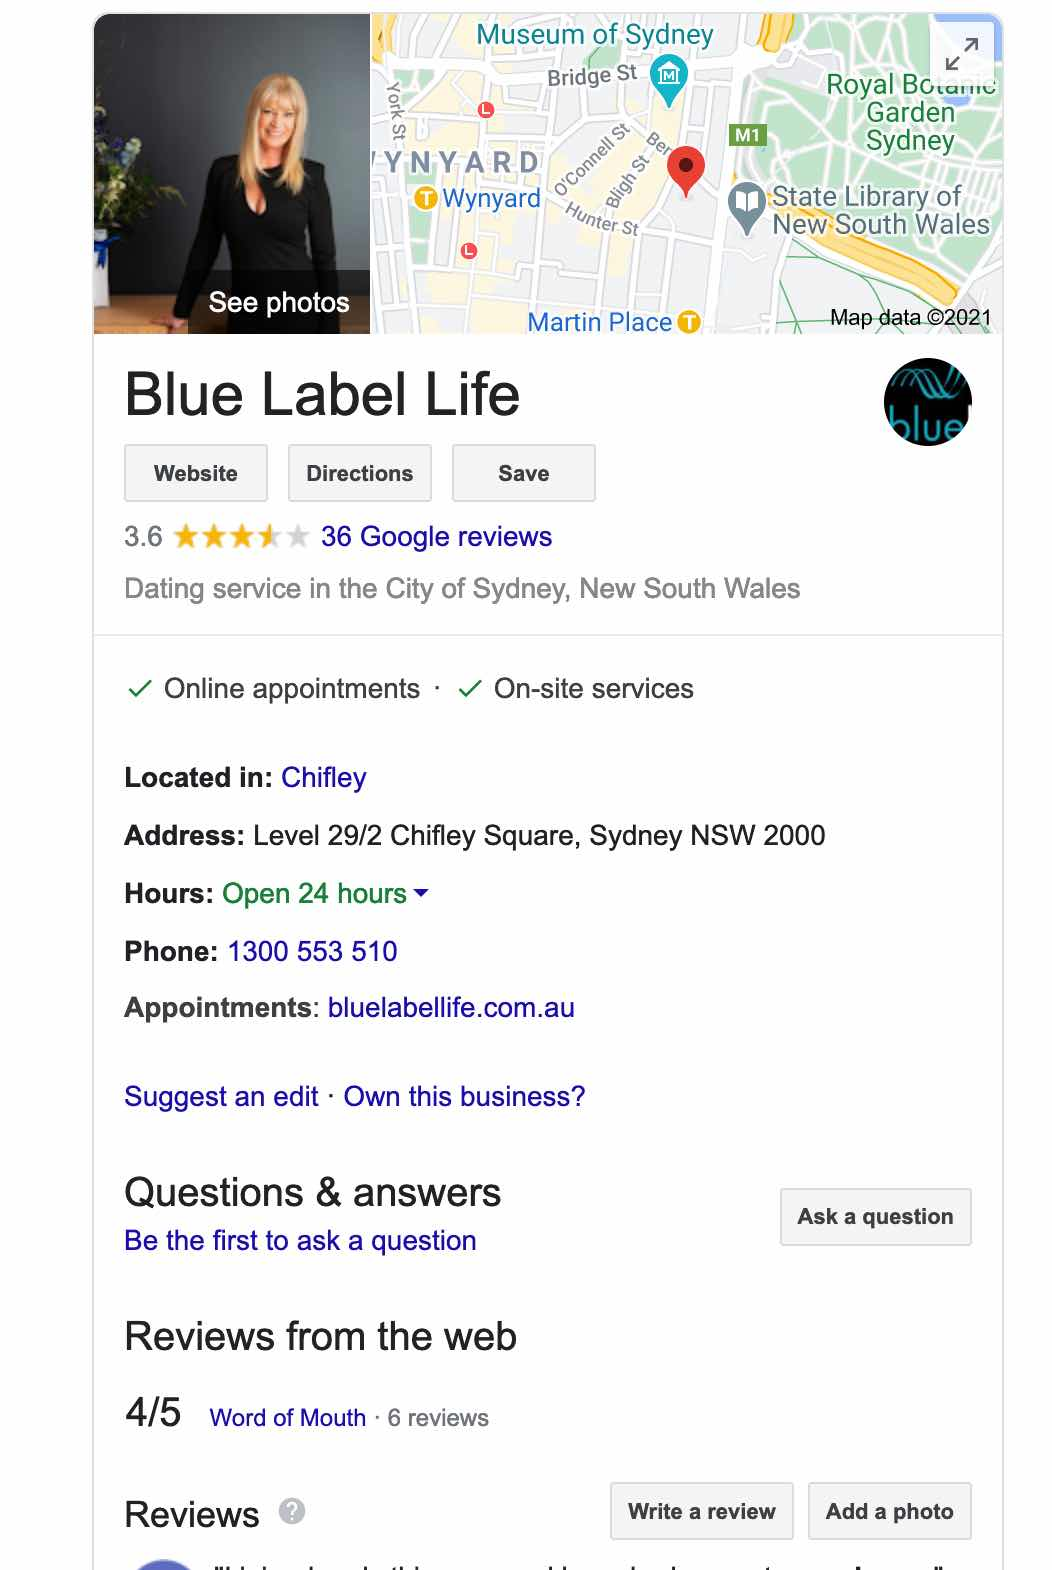 blue label life google reviews